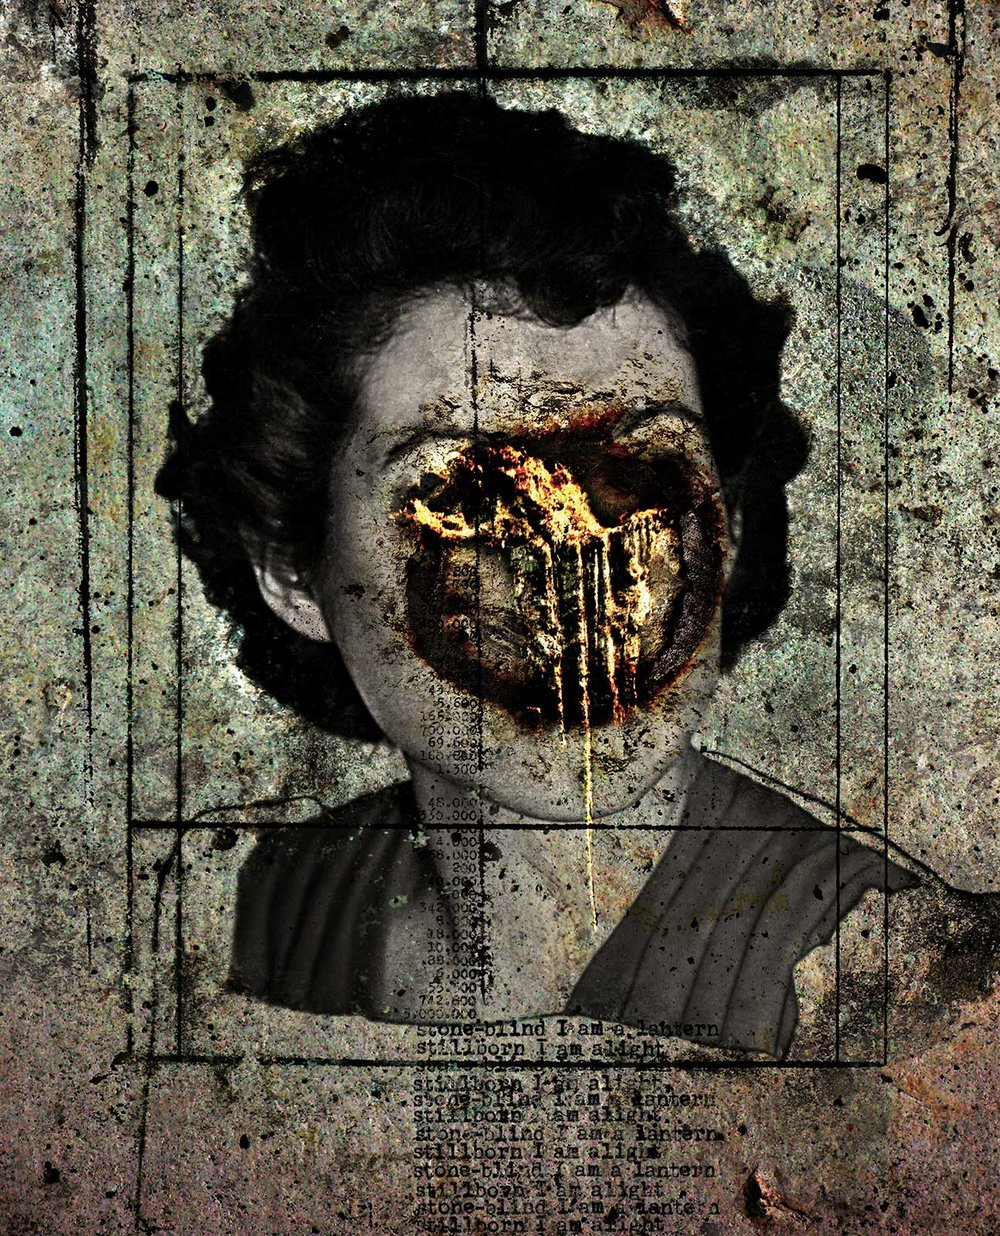 Frances (stone-blind)  2012 Archival pigment print 100 H x 81 W cm / 39 ¼ x 31 ¾ in